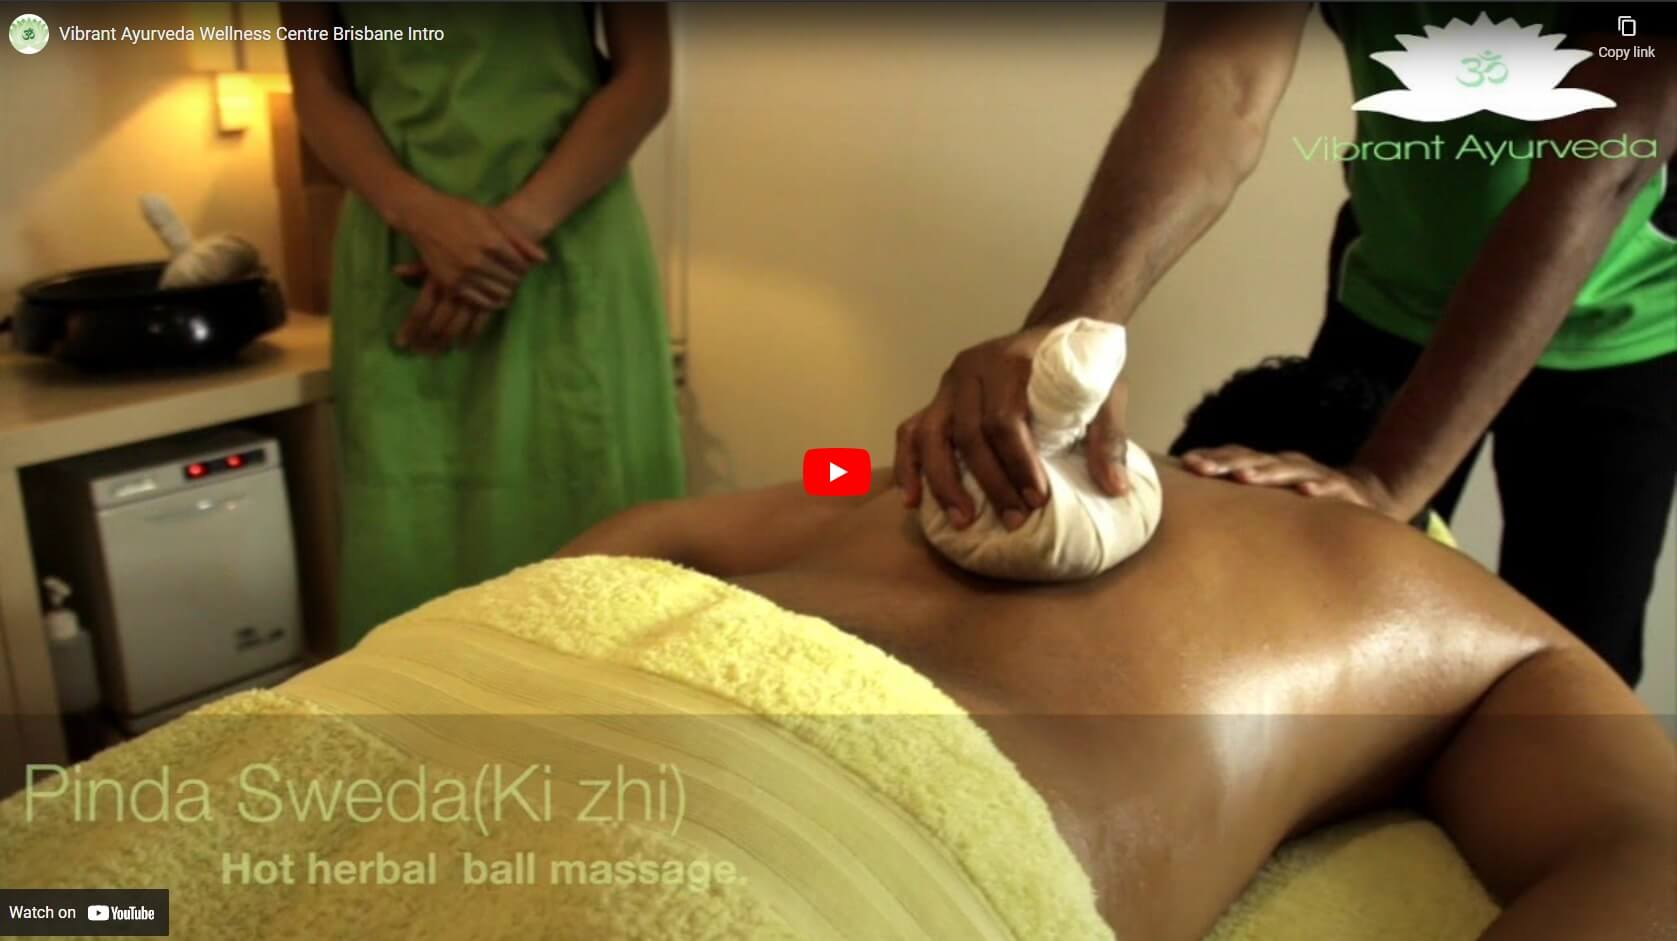 vibrant-ayurveda-wellness-centre-brisbane-intro-video